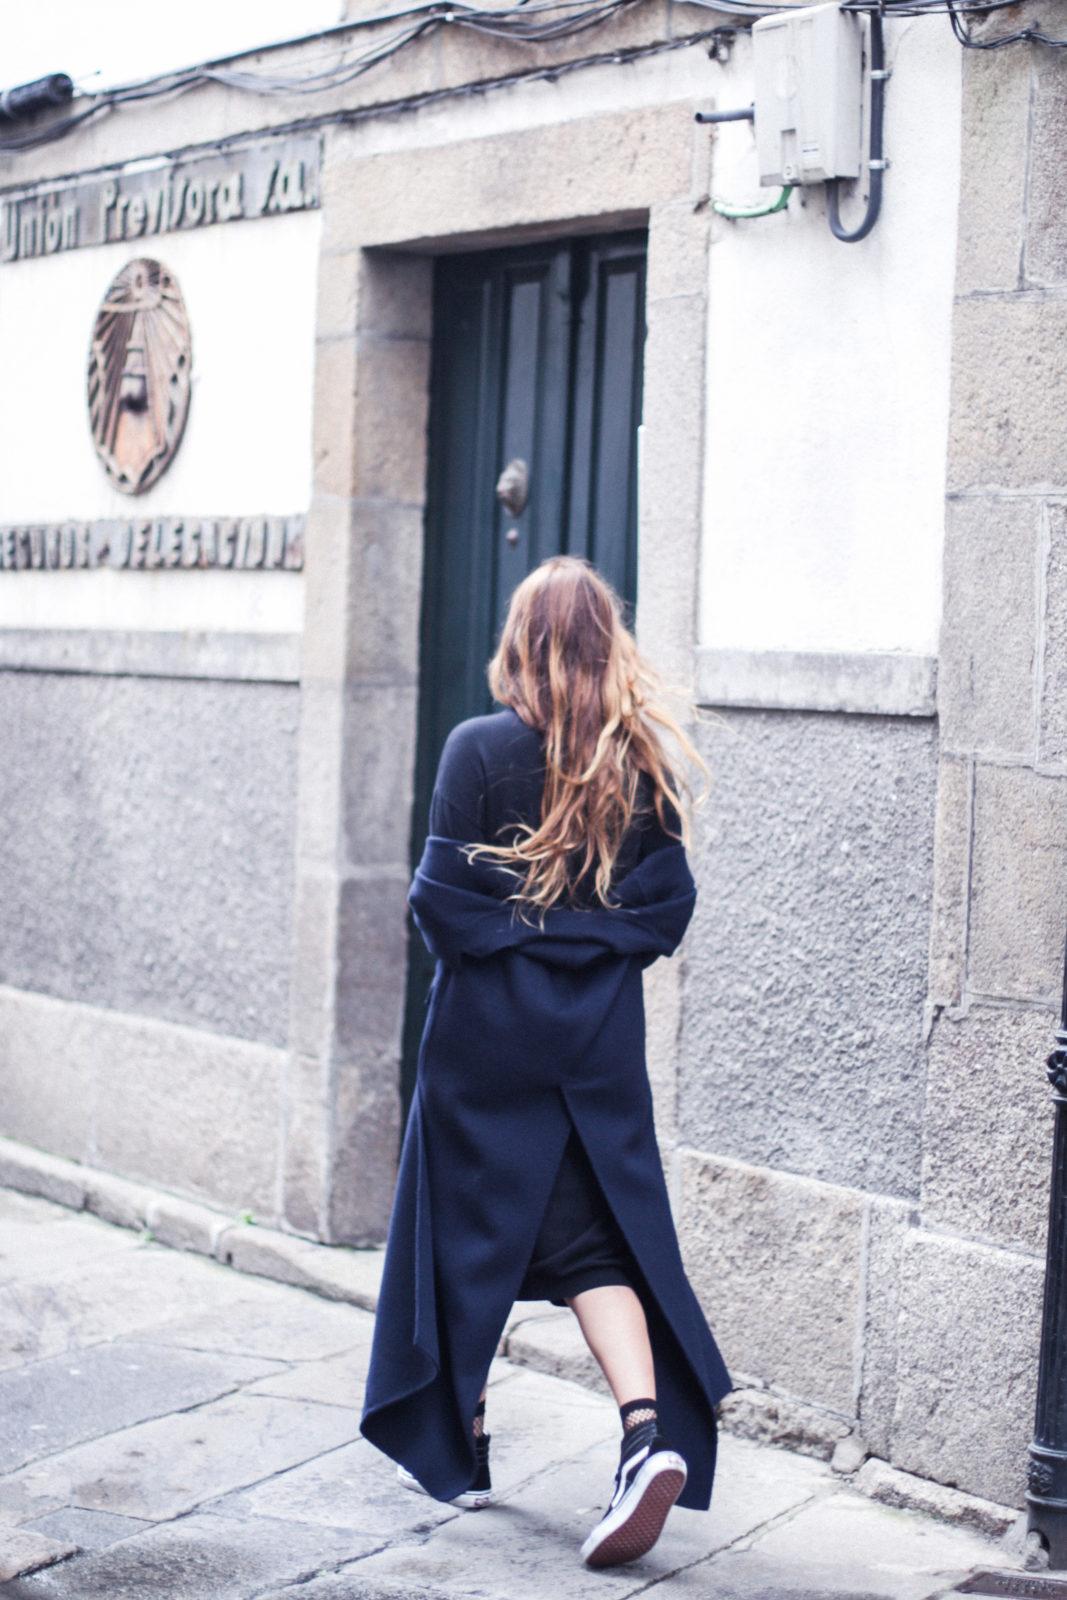 vestido_de_punto_midi_vans_calcetines_rejilla_choker_metalico_happiness_boutique_abrigo_largo_gucci_street_style_fall_2016_donkeycool-35